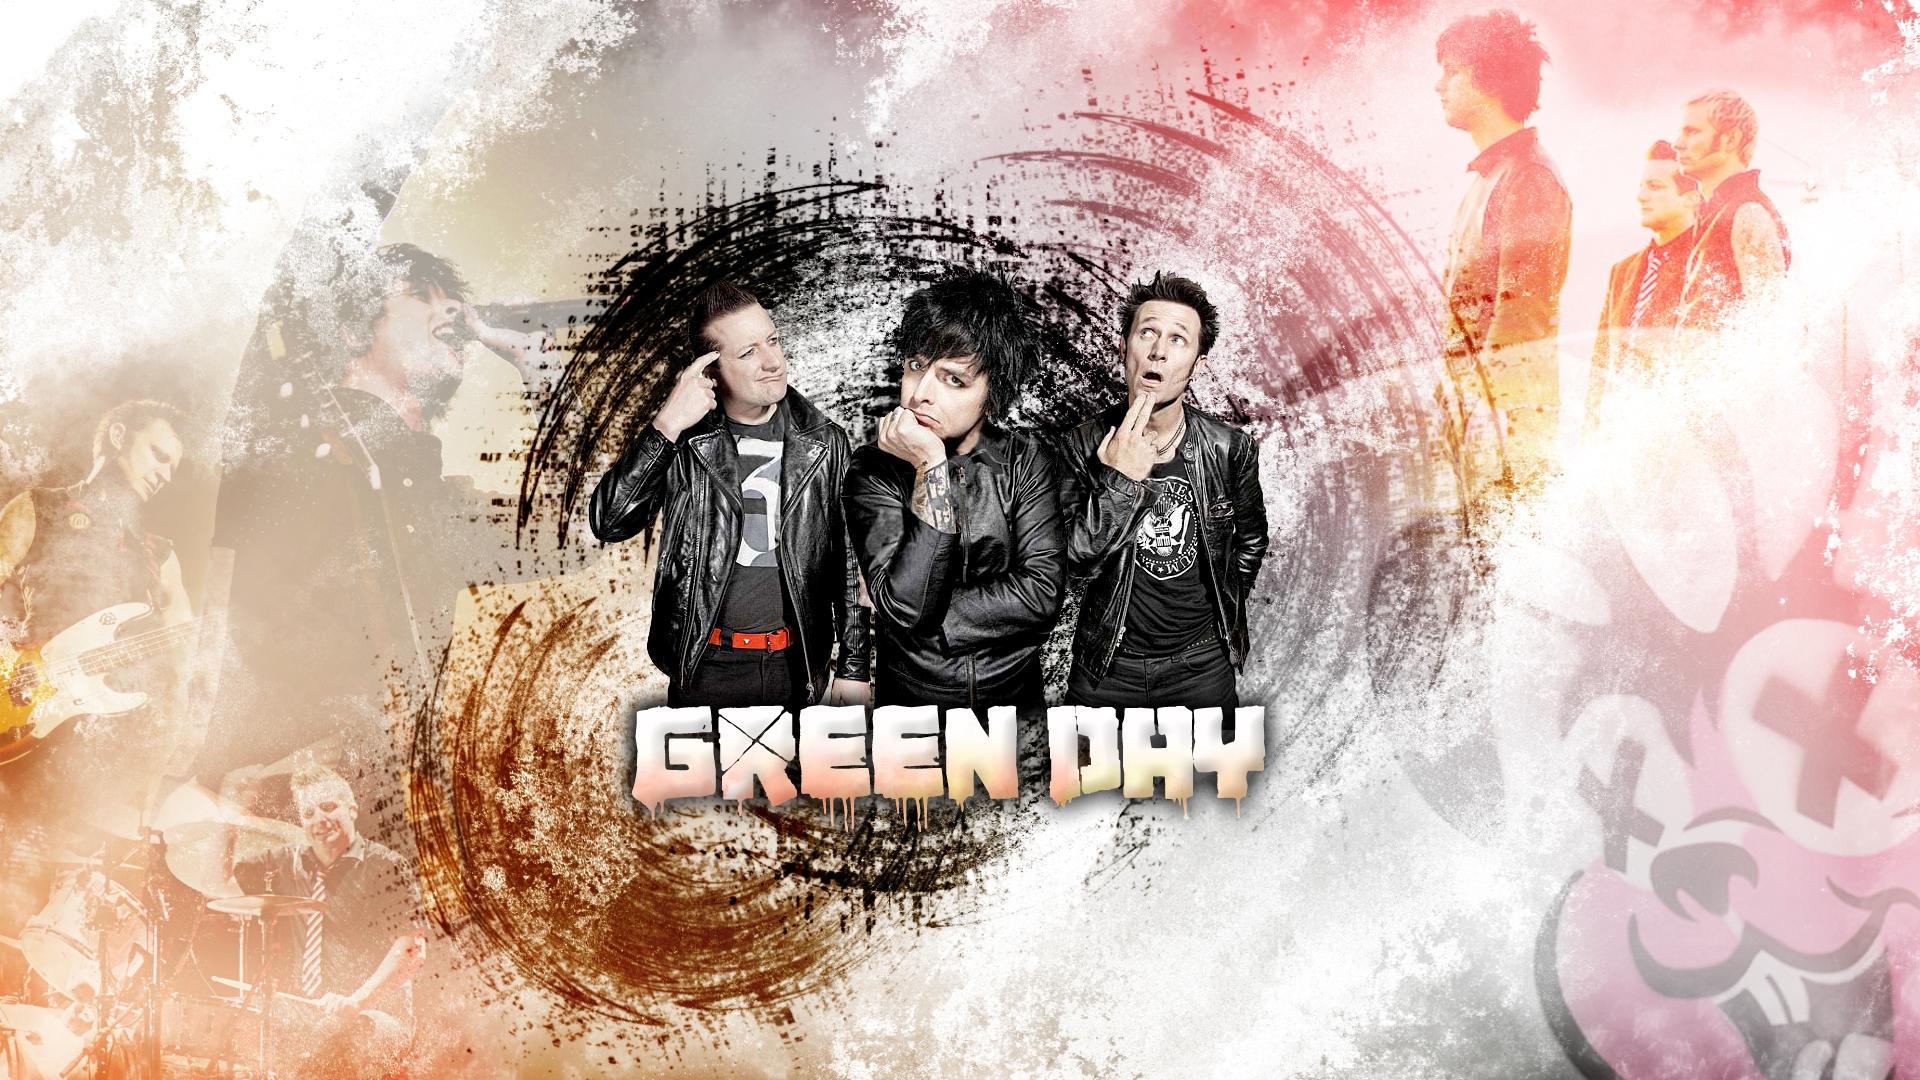 Green Day Hd Wallpaper Hintergrund 1920x1080 Id 708430